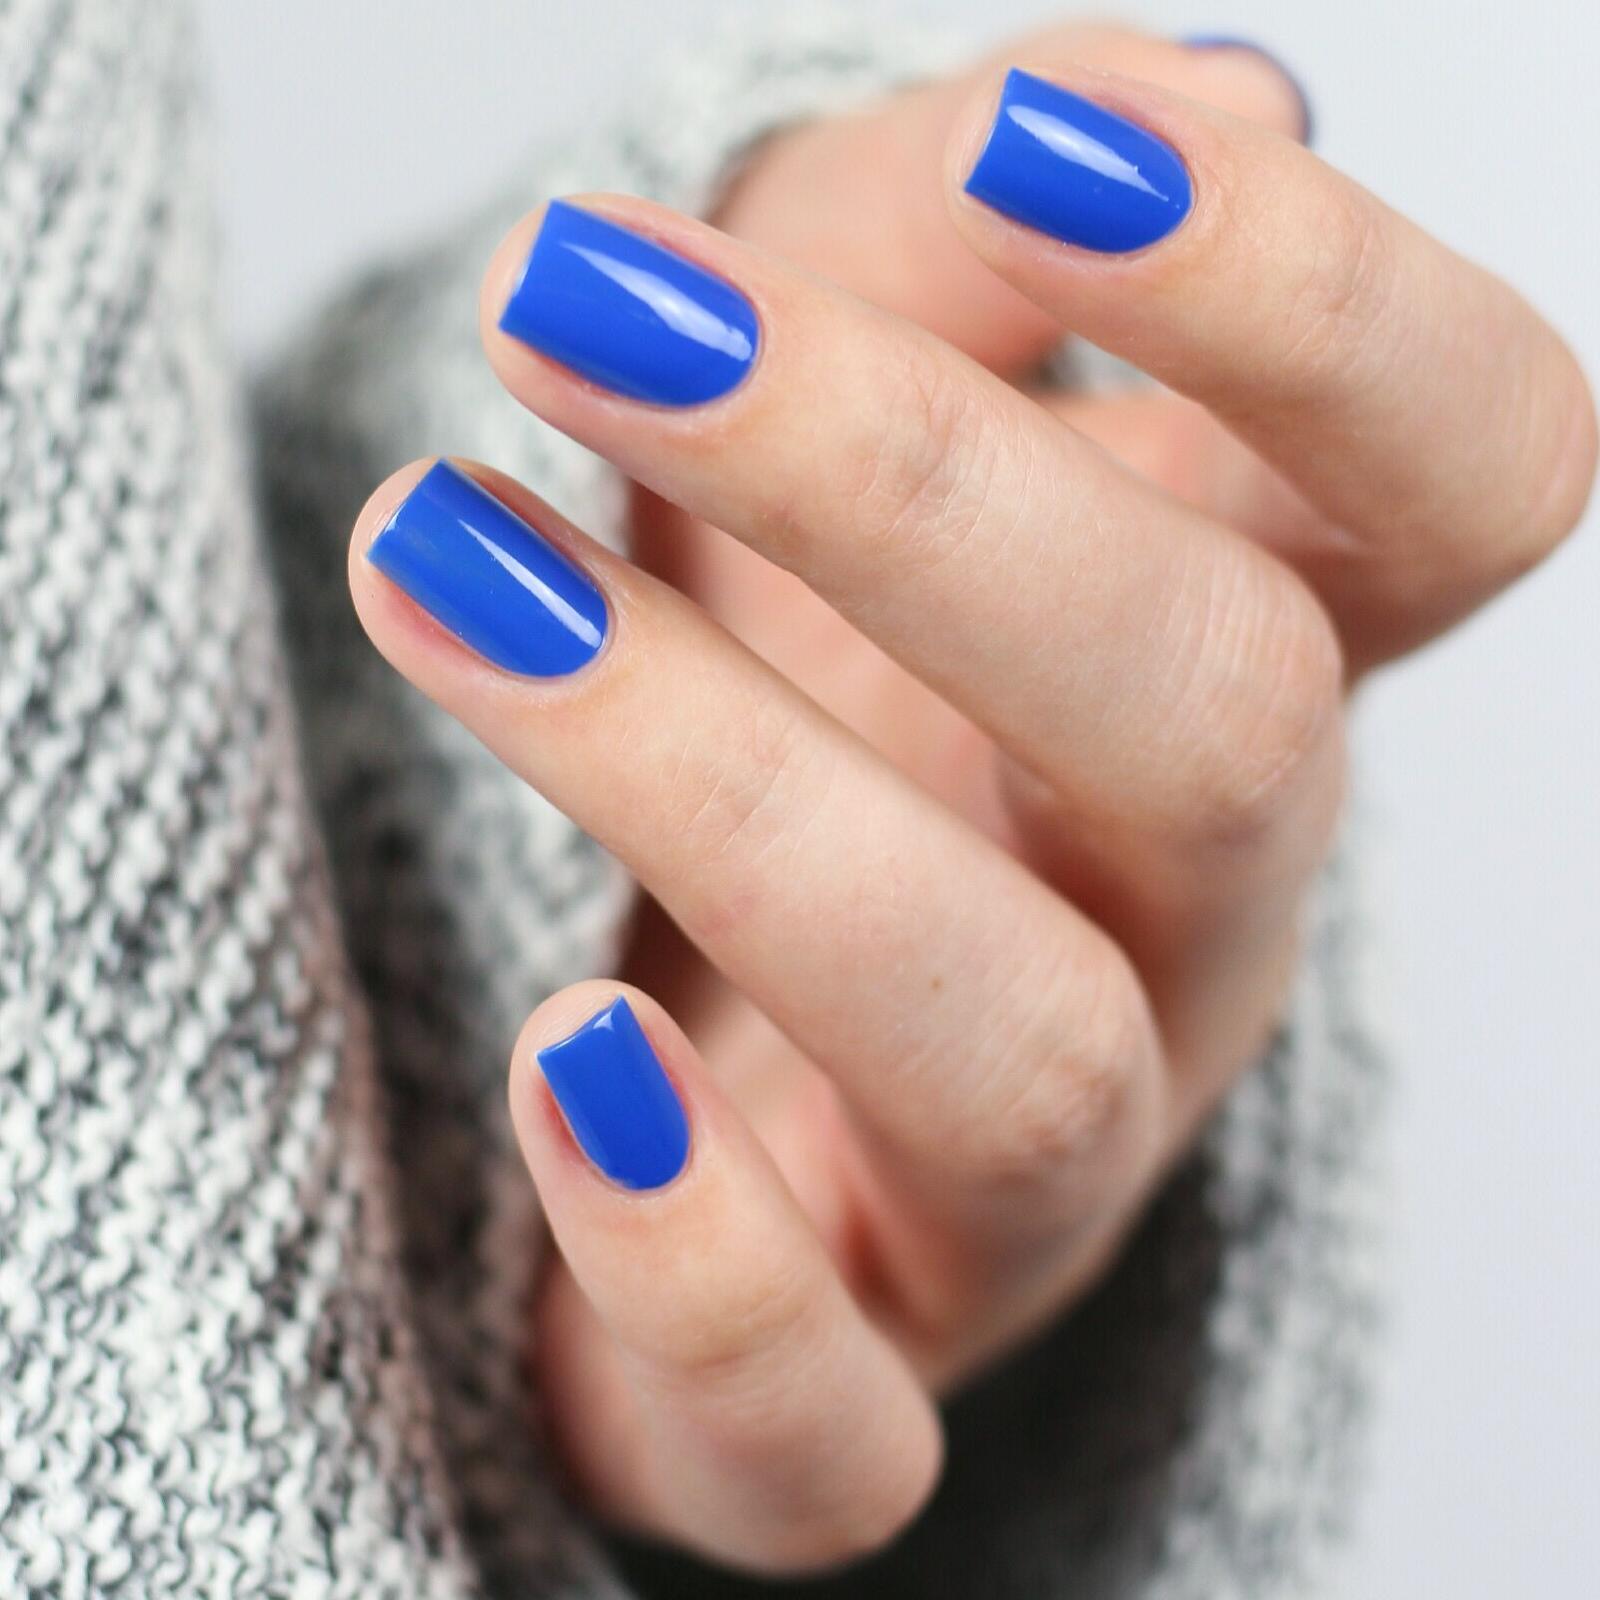 Nails Inc.blauer Gel-Effekt Nagellack in der Nuance Baker Street ...